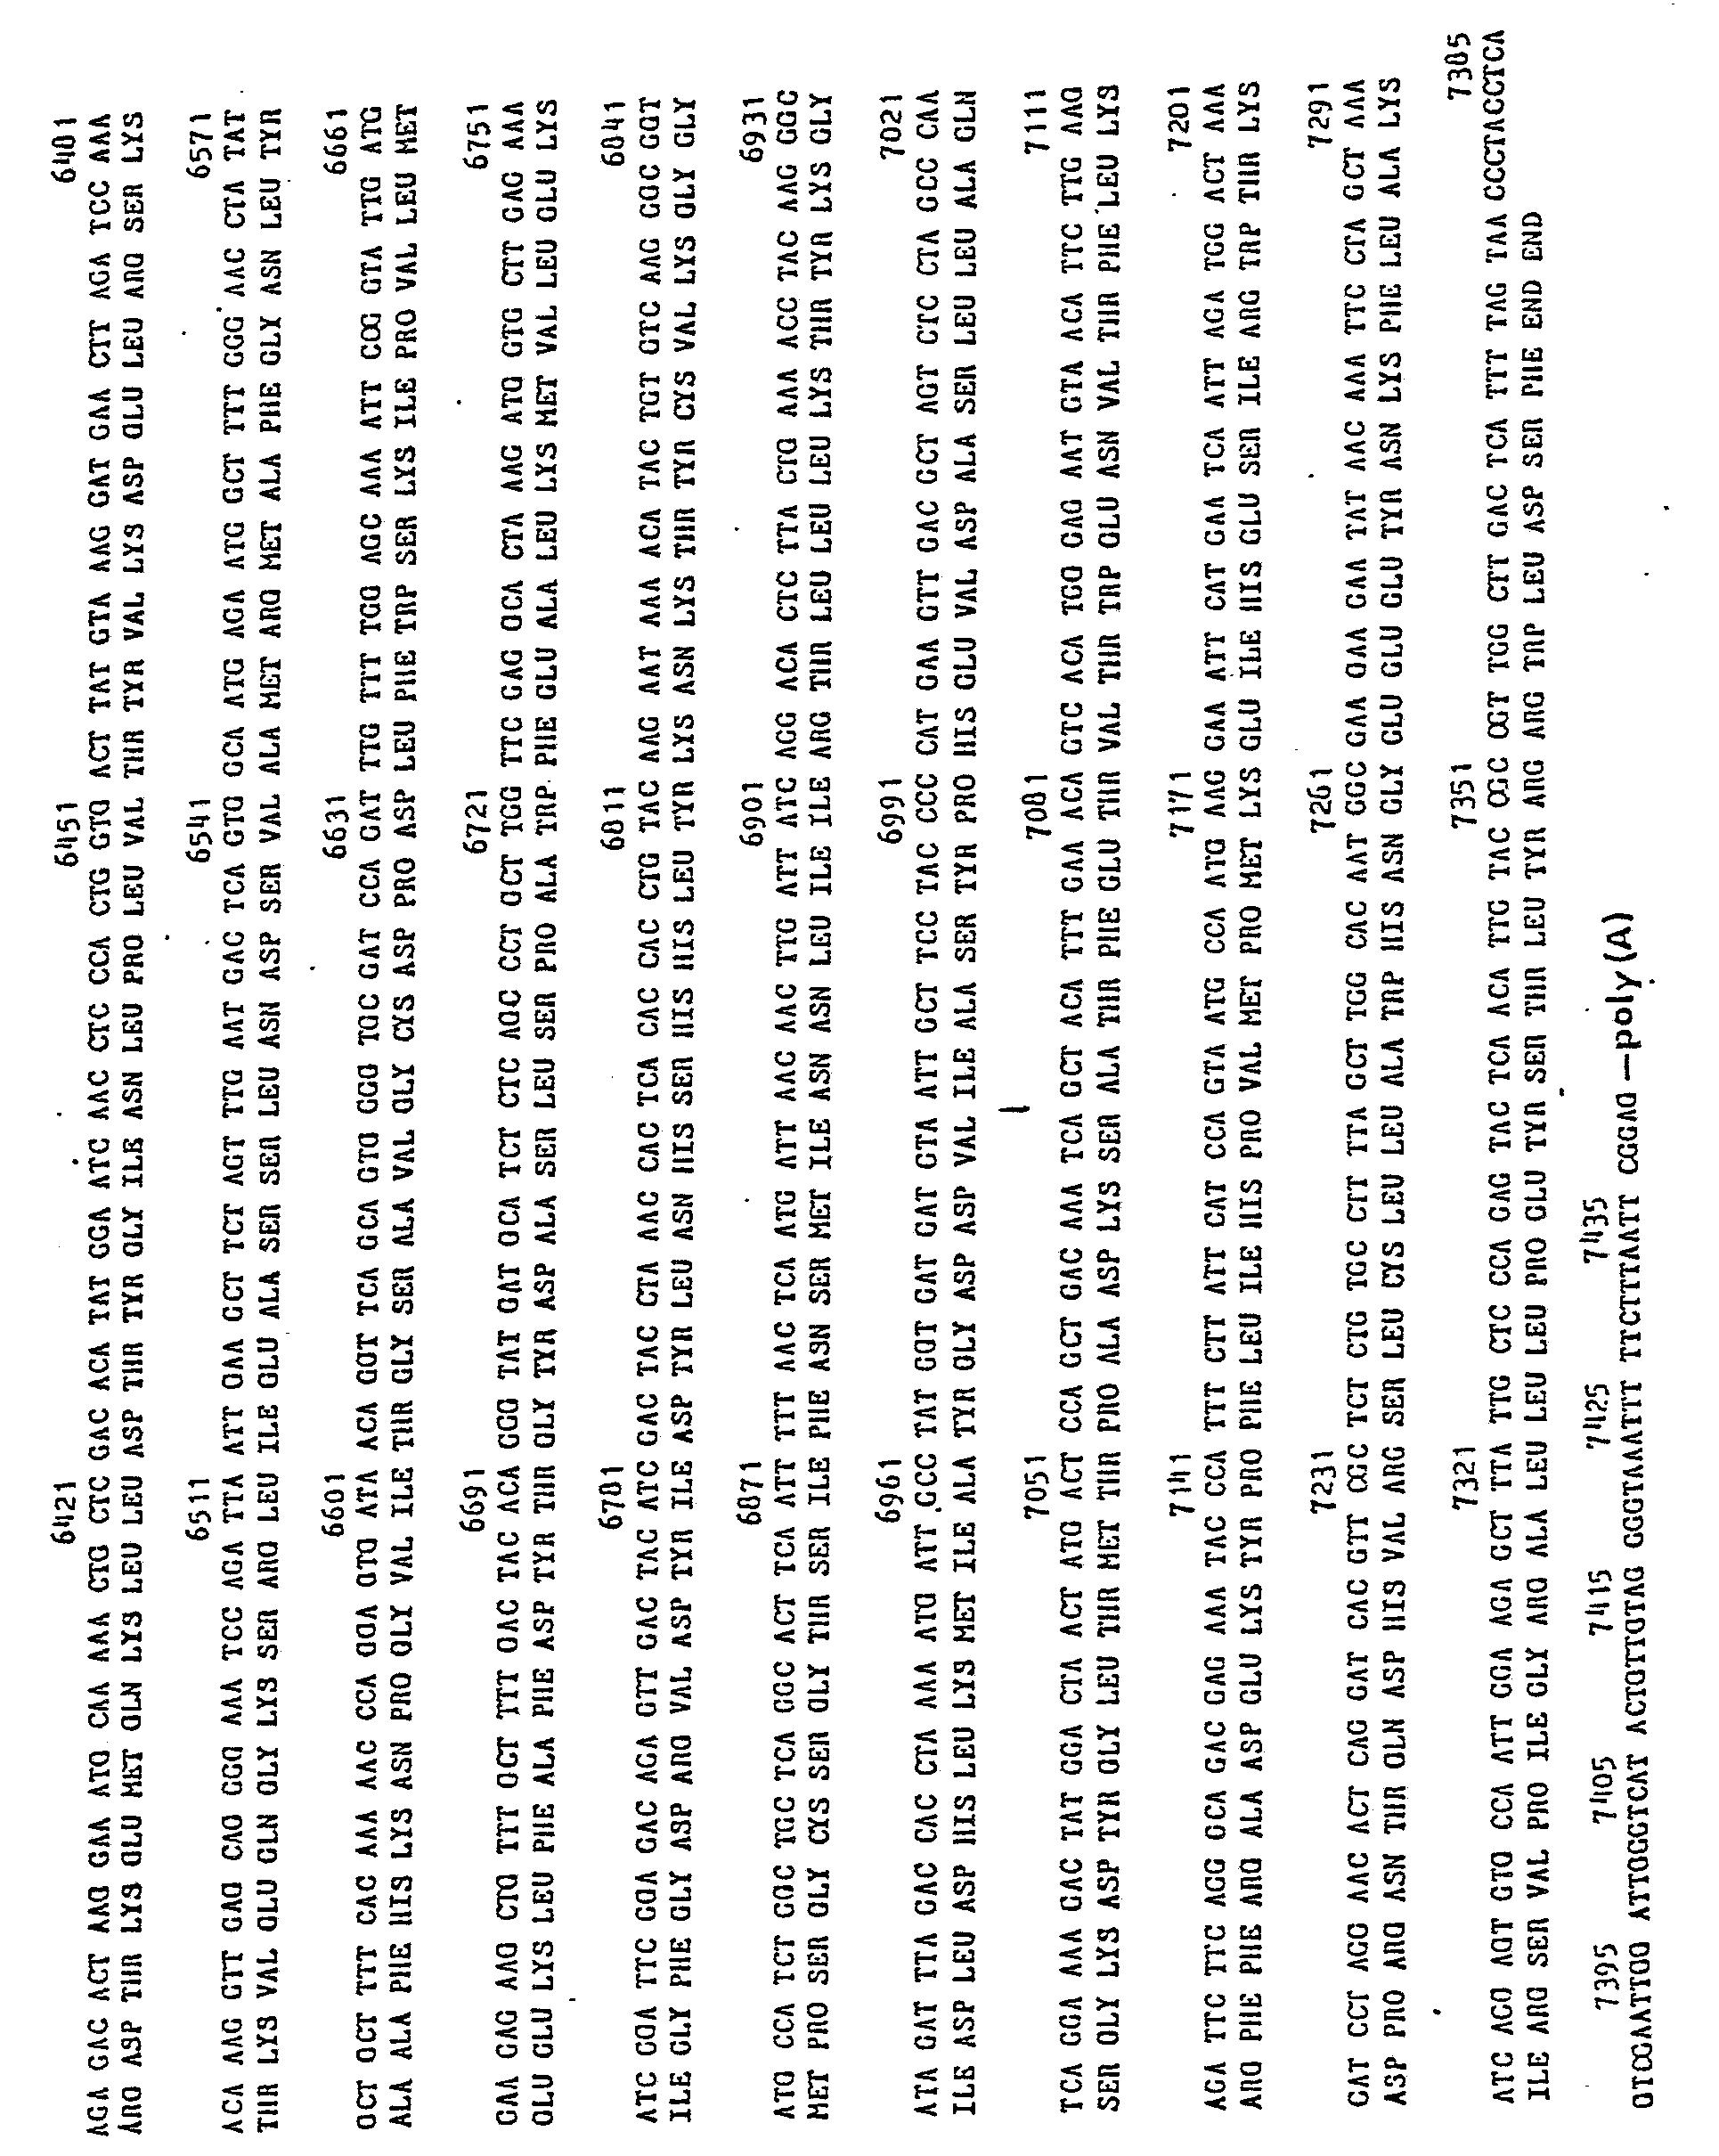 WO1982003632A1 - cDNA REPRESENTING RNA VIRAL SEQUENCES - Google Patents